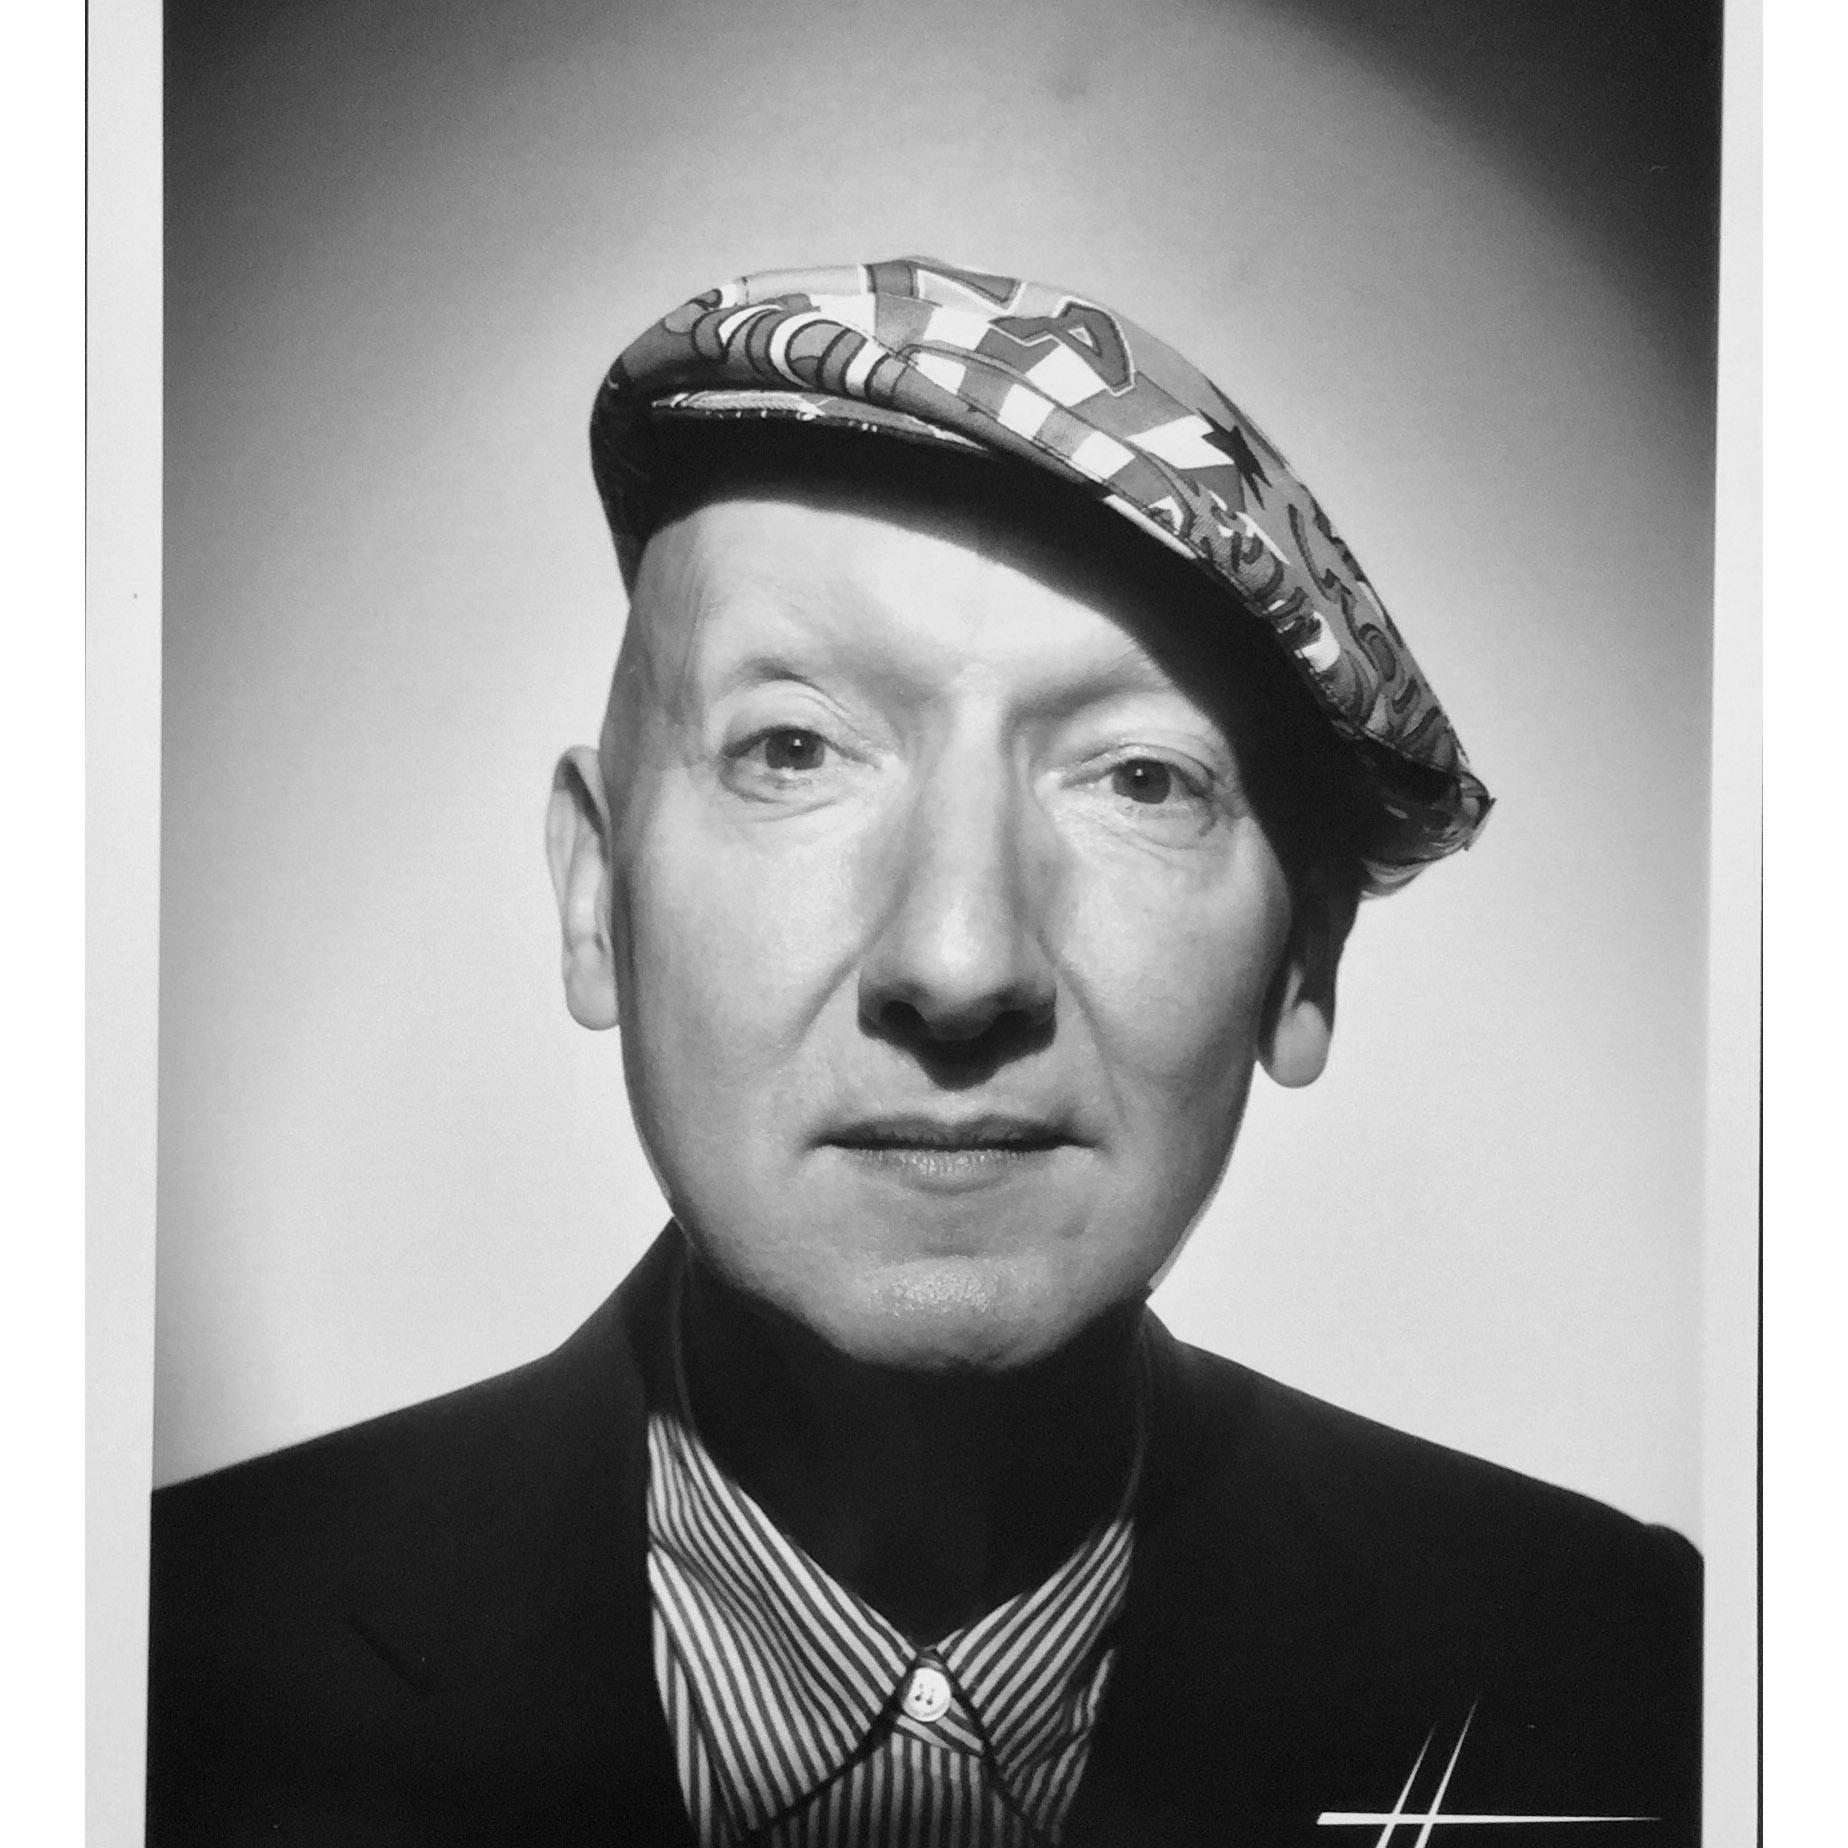 Stephen Jones OBE